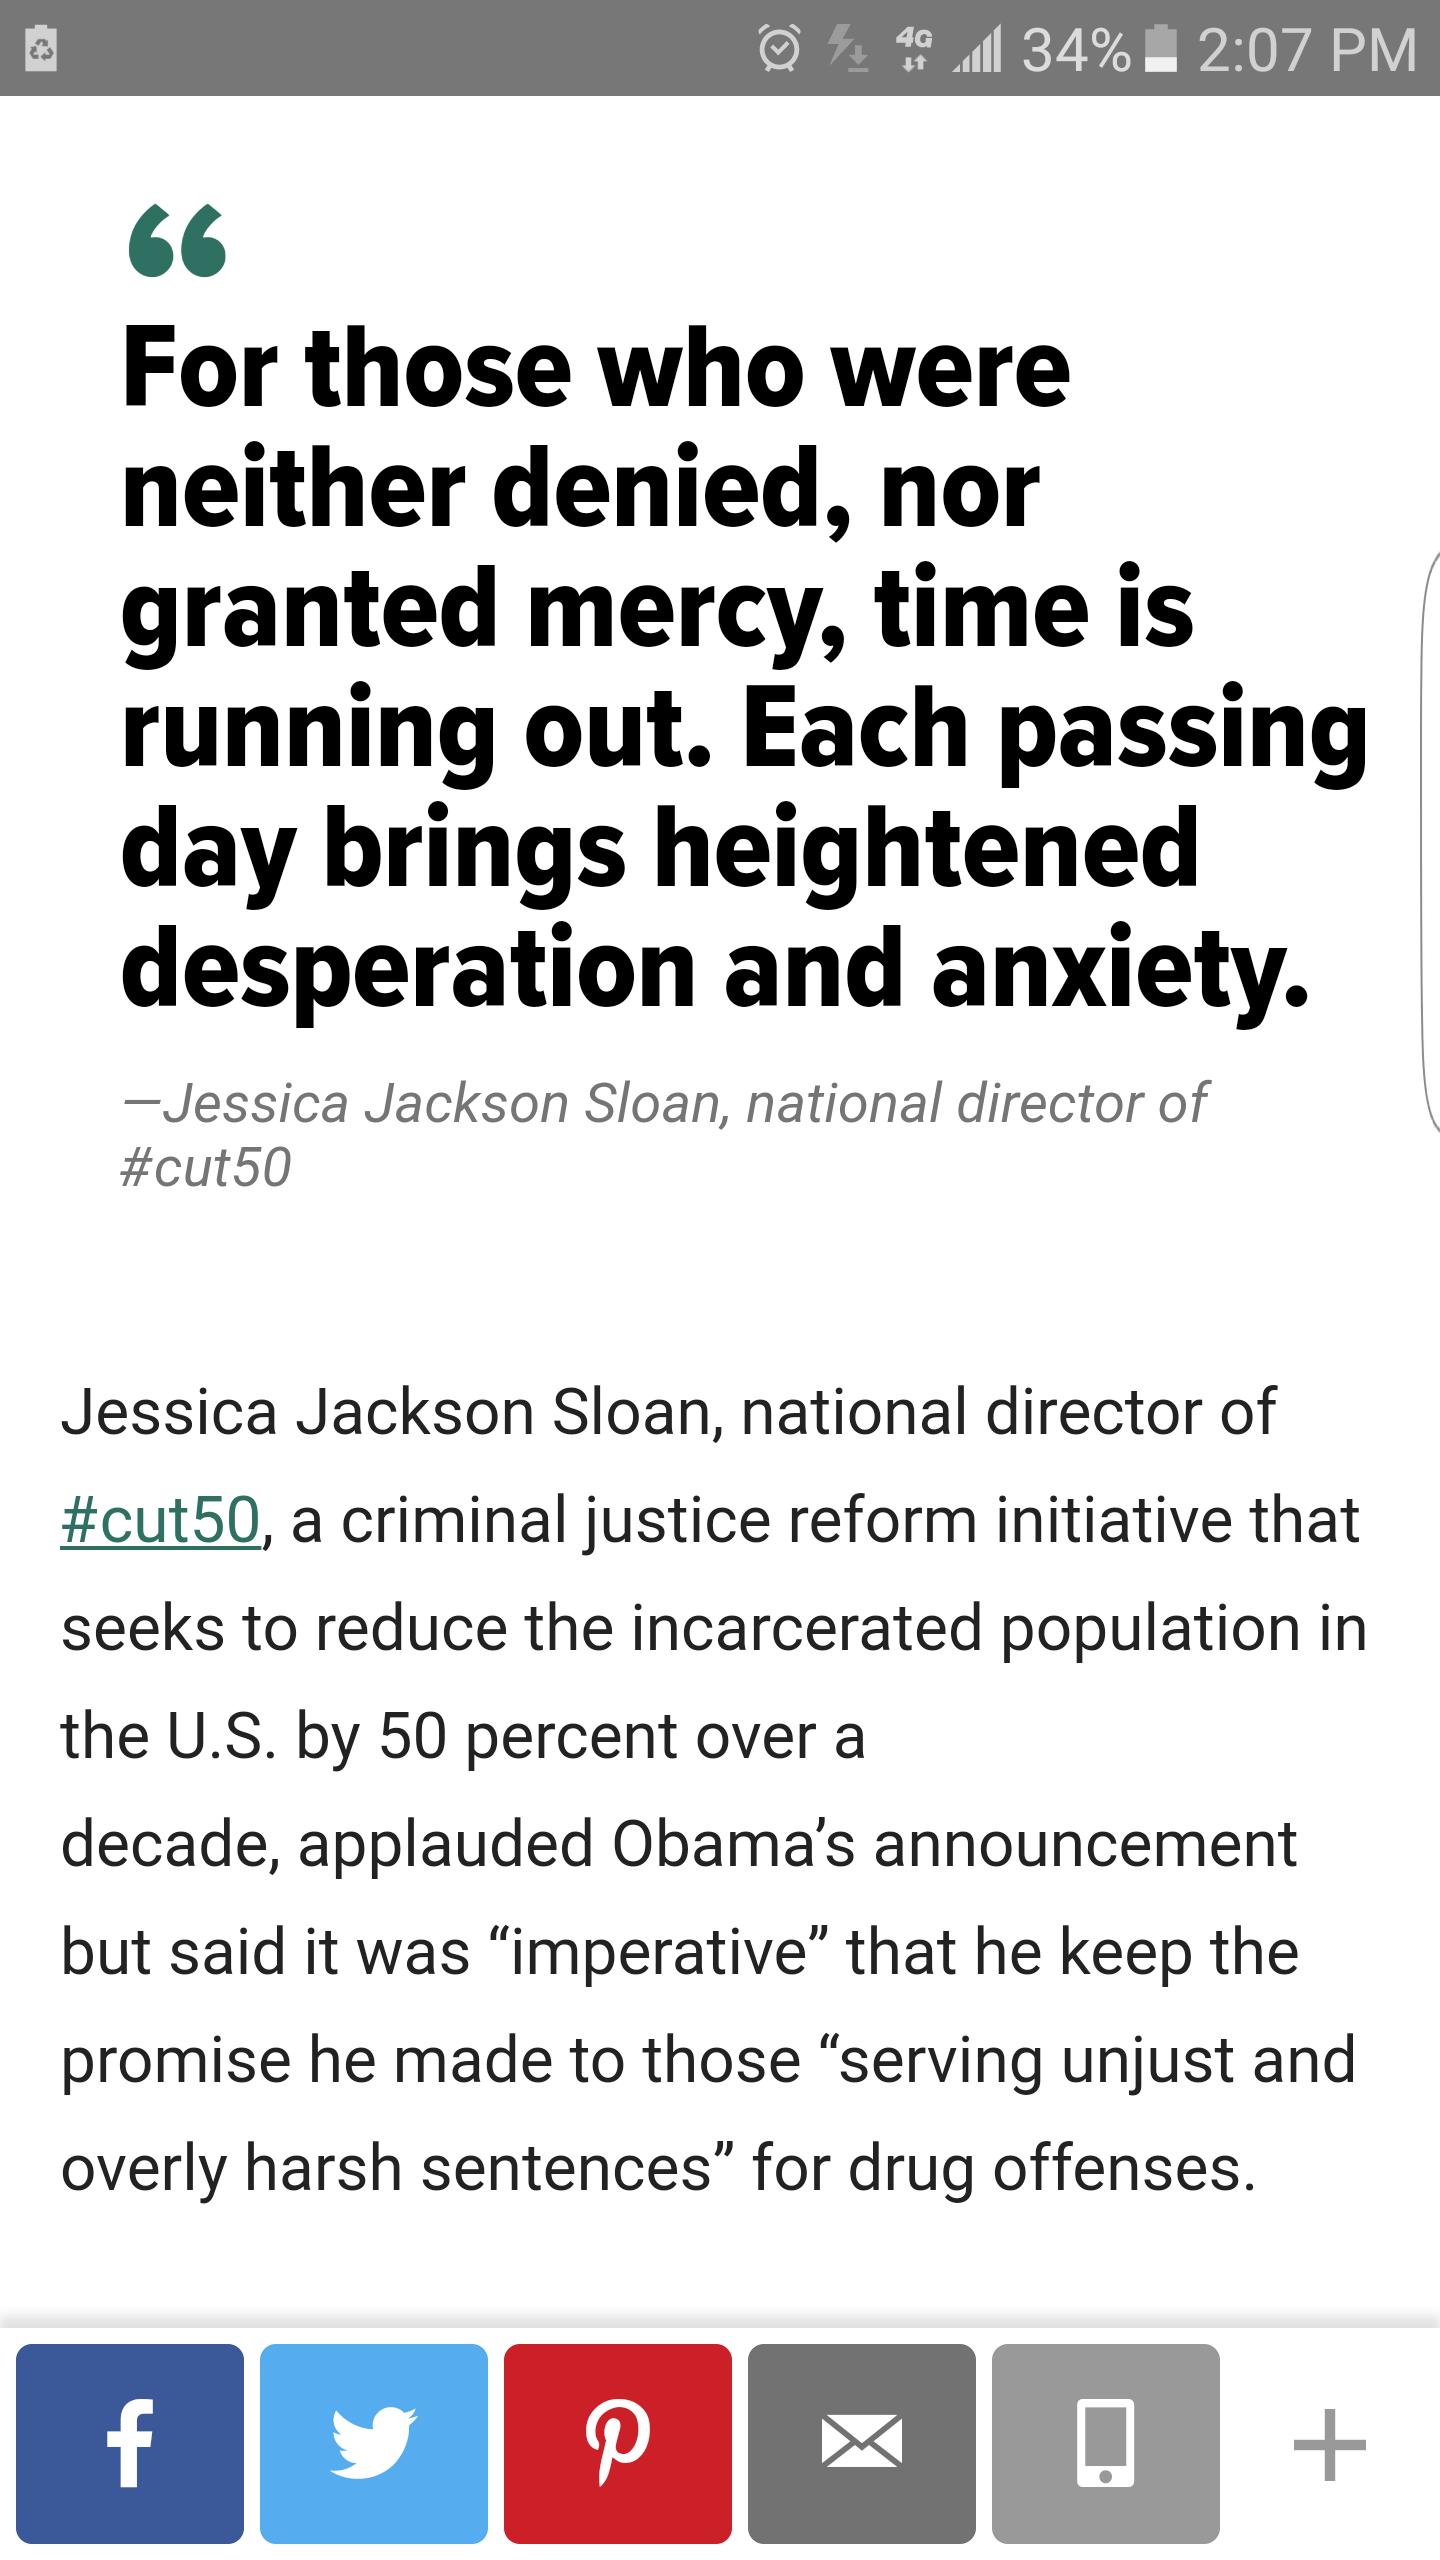 Barack Obama Just Cut The Sentences Of 98 Drug Offenders. Dozens Would Have Died Behind Bars.